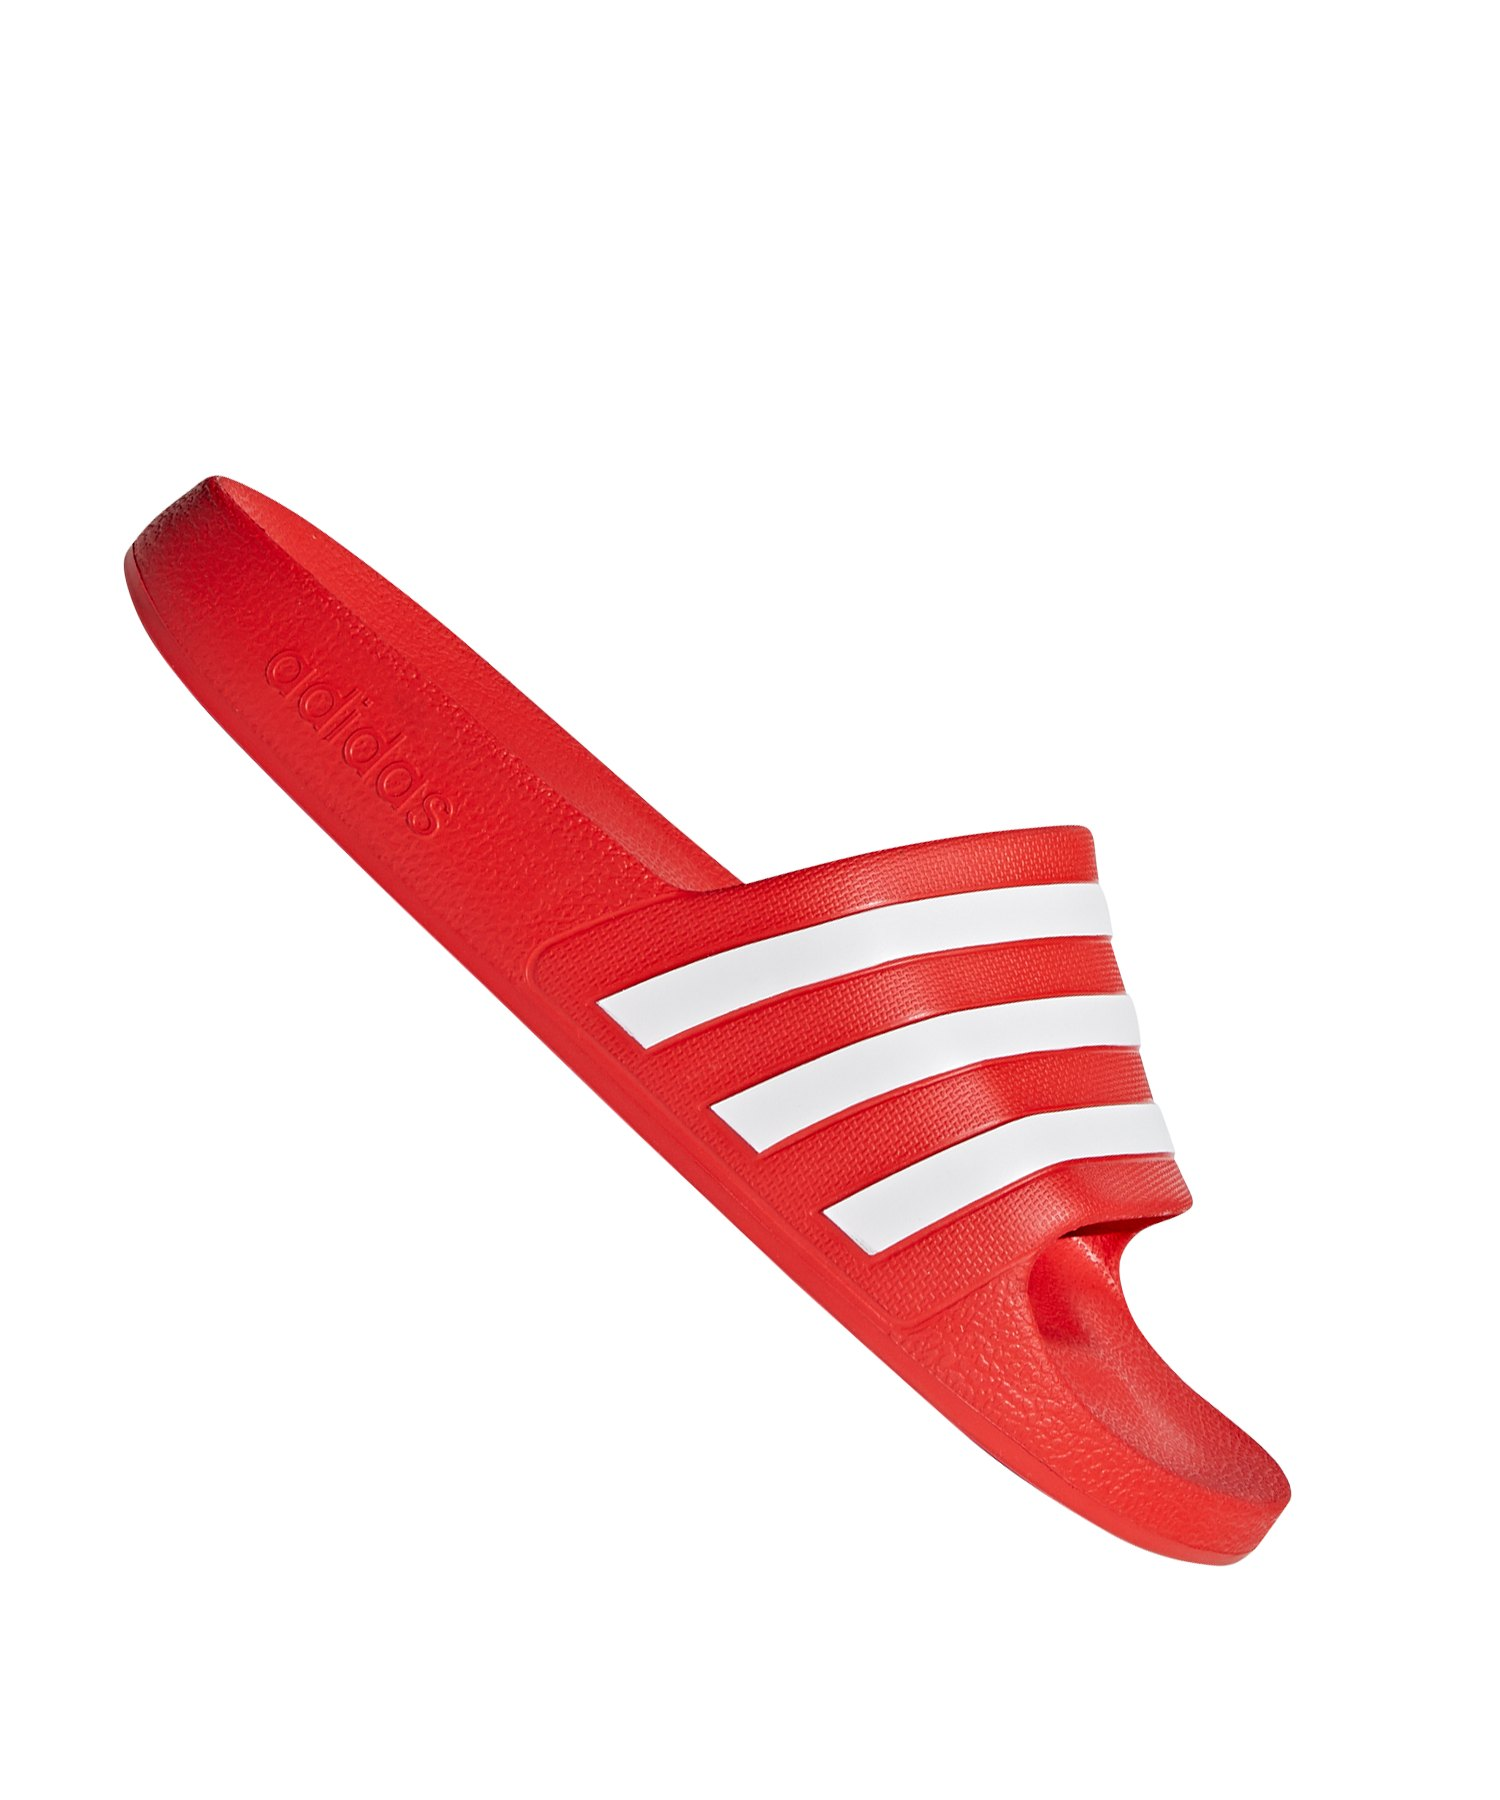 89cef7003cc adidas Adilette Aqua Badelatsche Rot |Lifestyle | Freizeit | Strasse ...